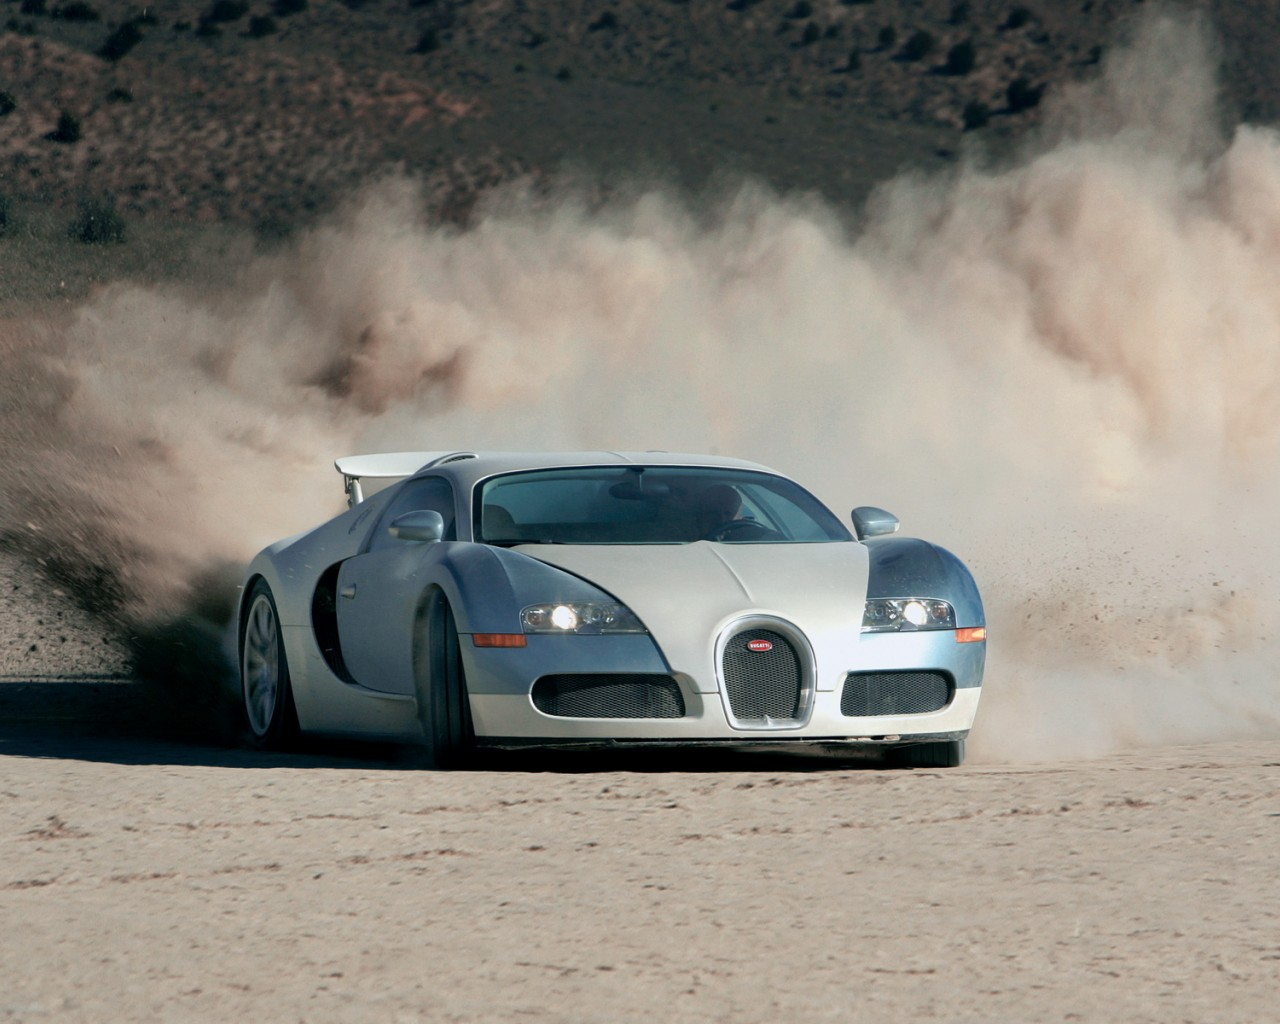 Bugatti Veyron - World First Fastest Car , HD Wallpaper & Backgrounds